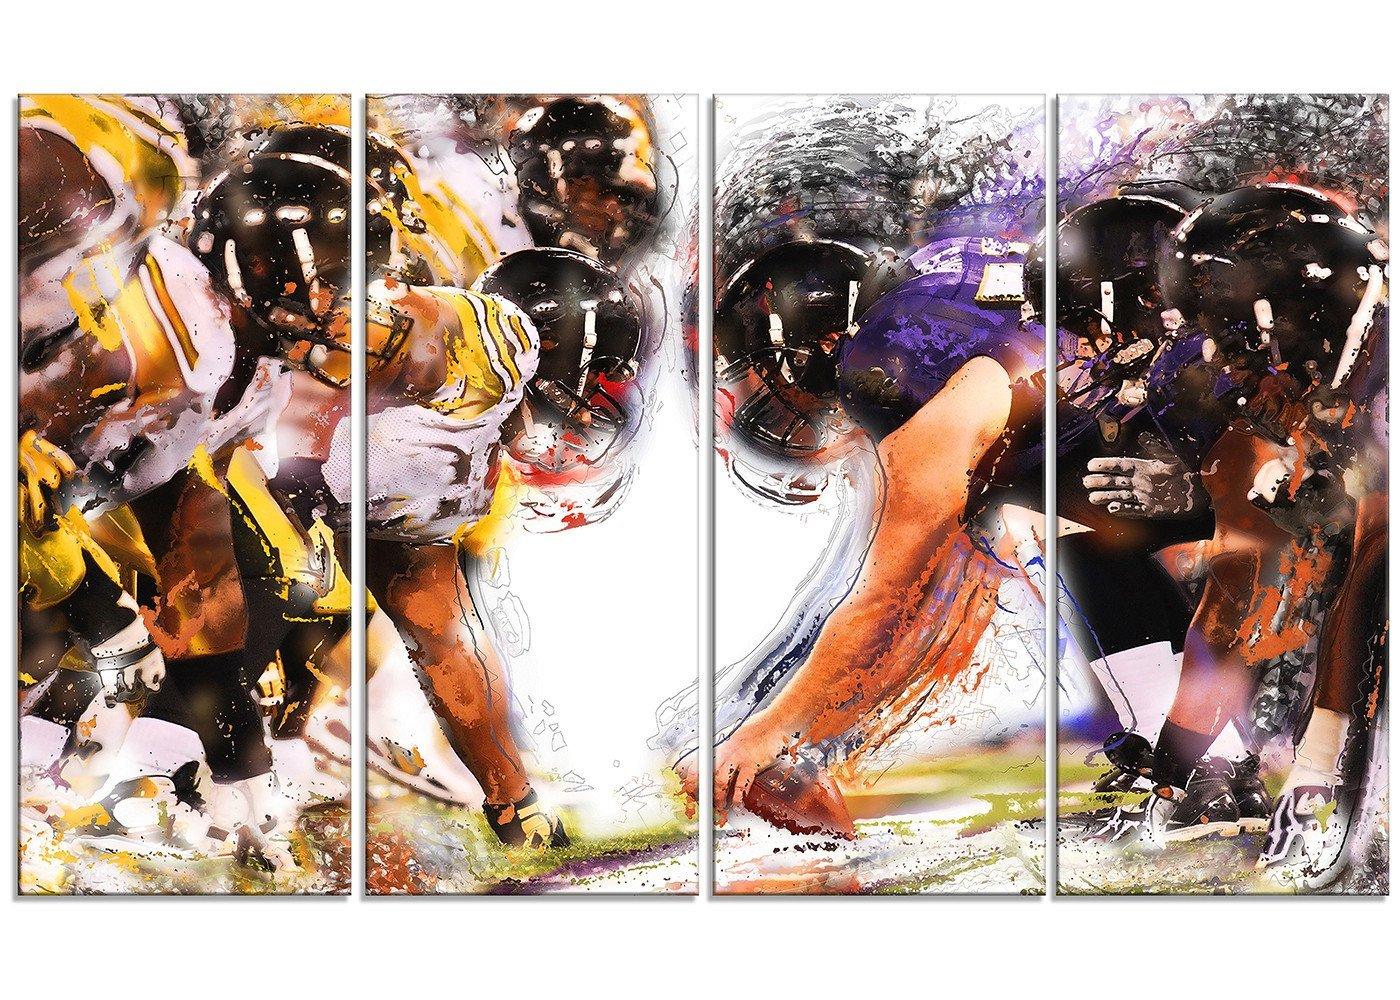 Digital art PT2548-32-16 Football Hut - Large Sport Canvas Art Print 32x16